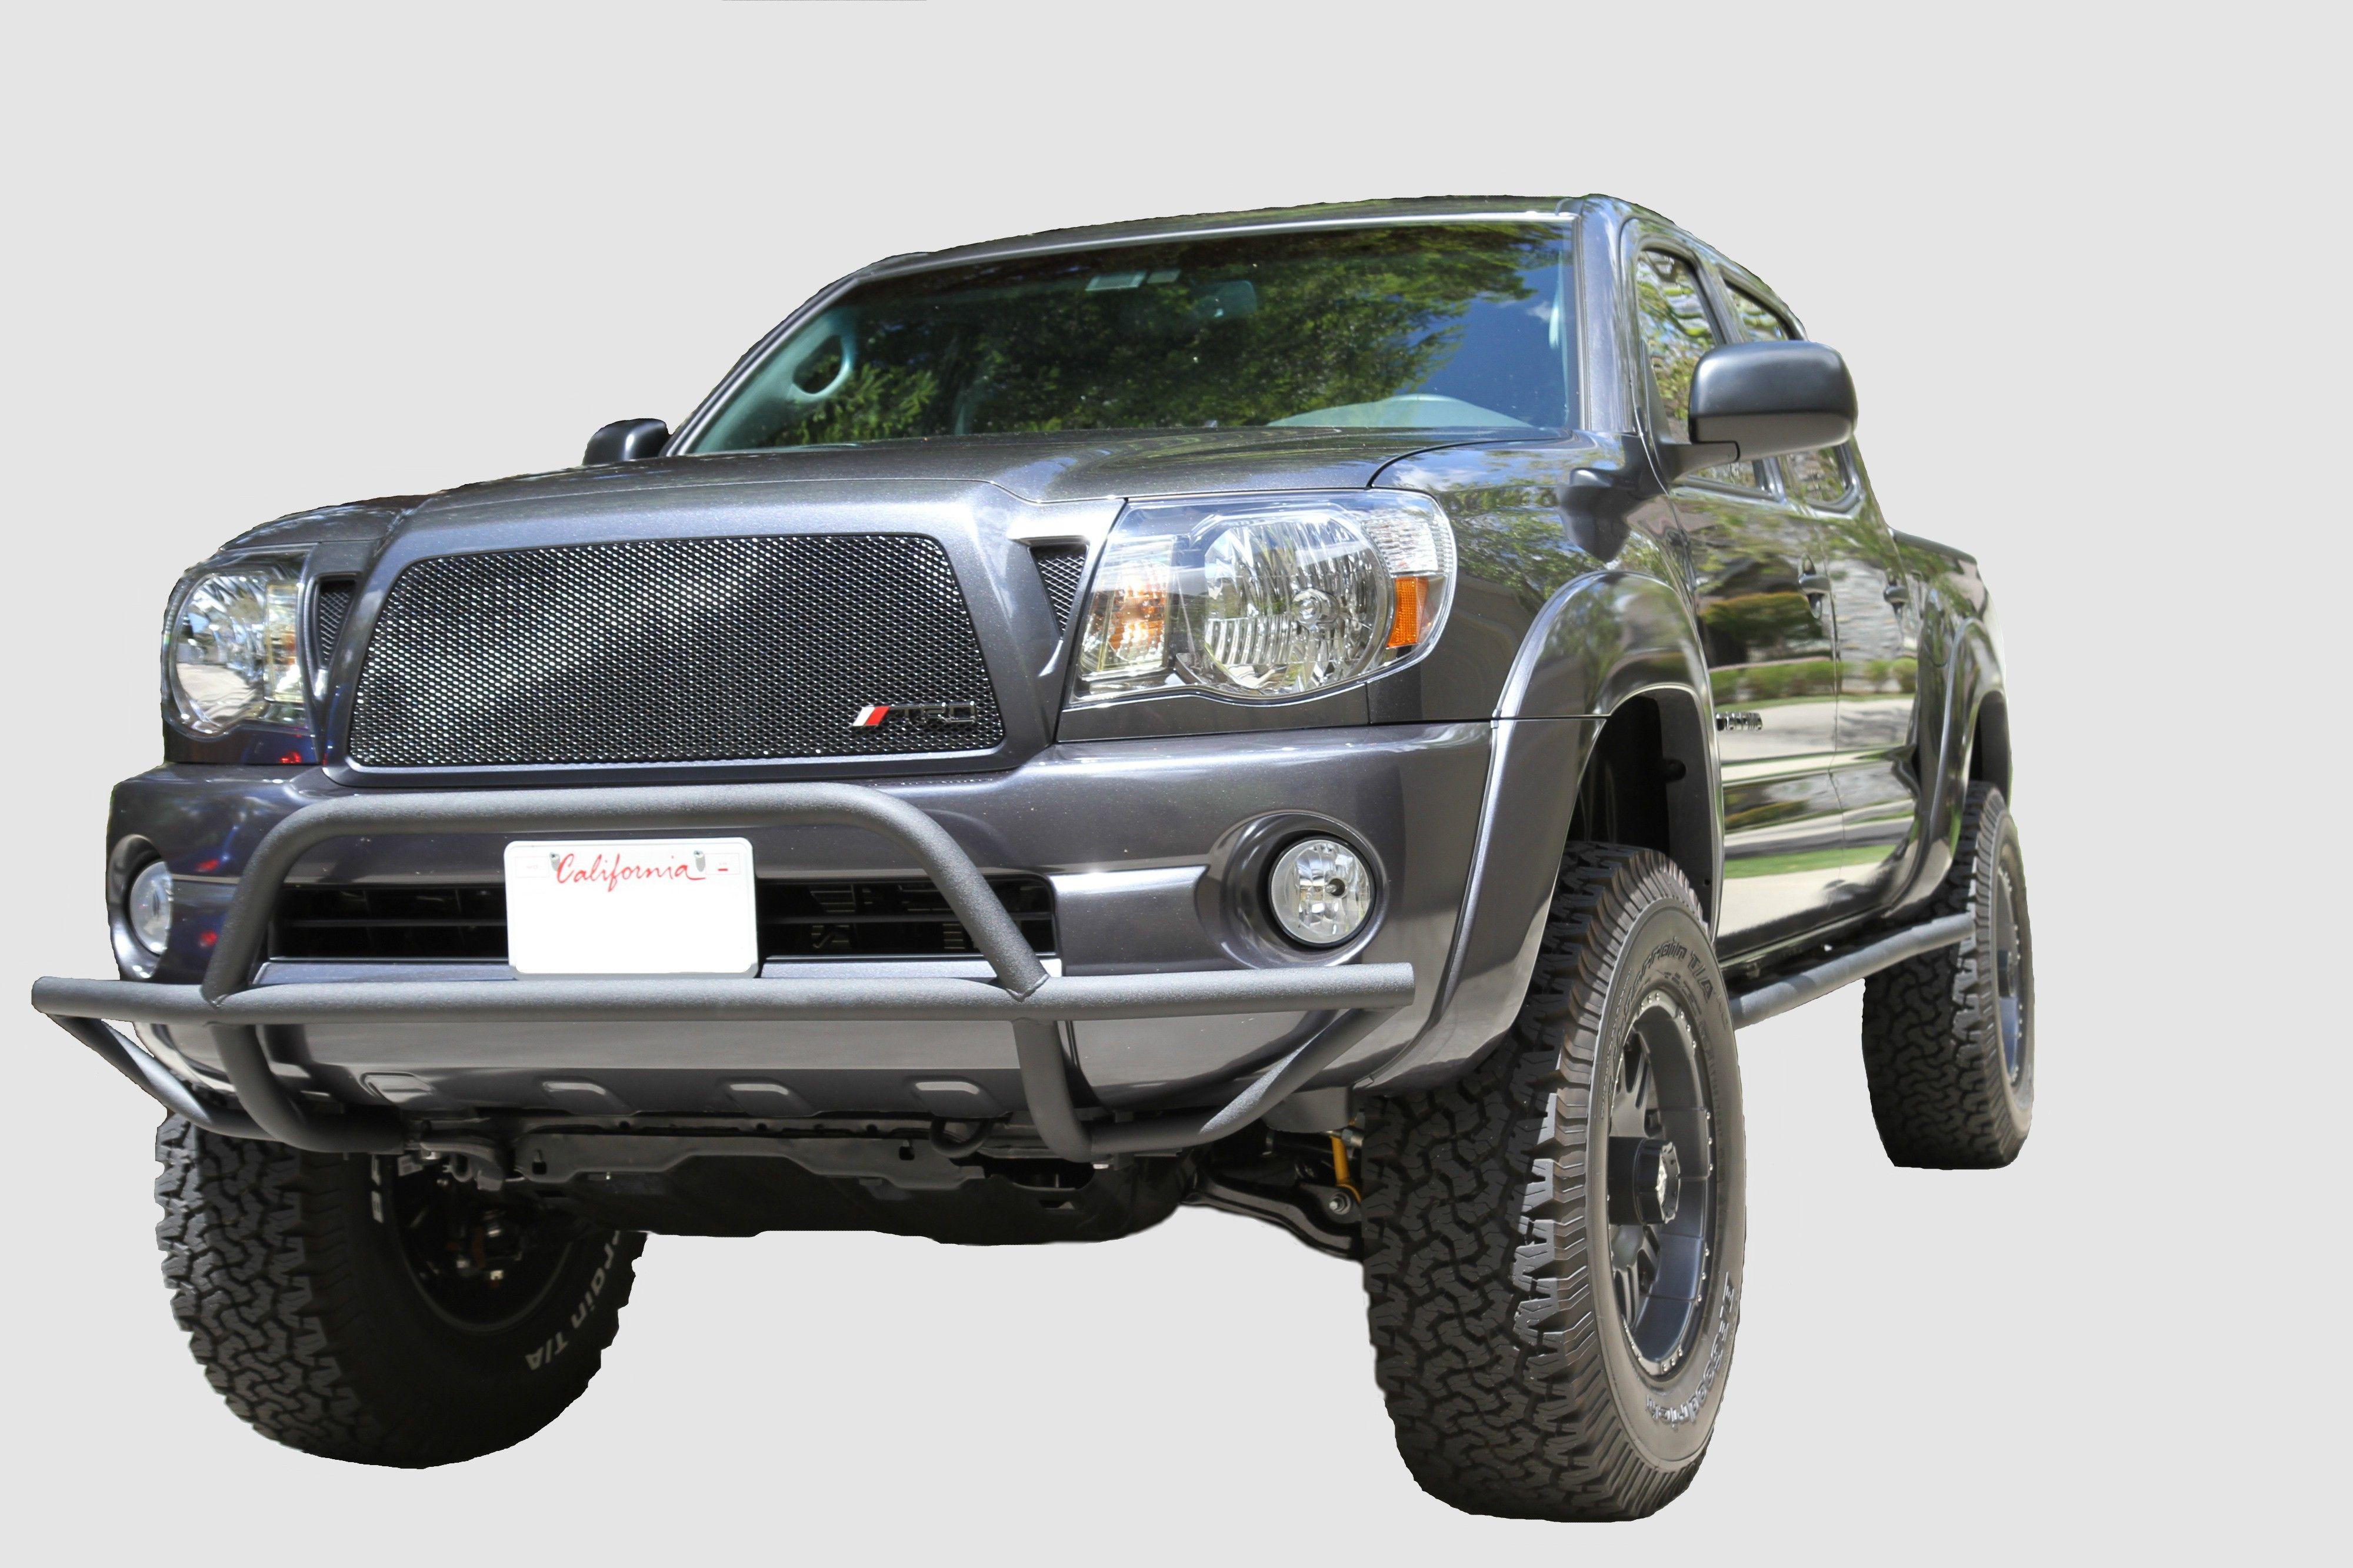 2005 2011 toyota tacoma front bumper guard